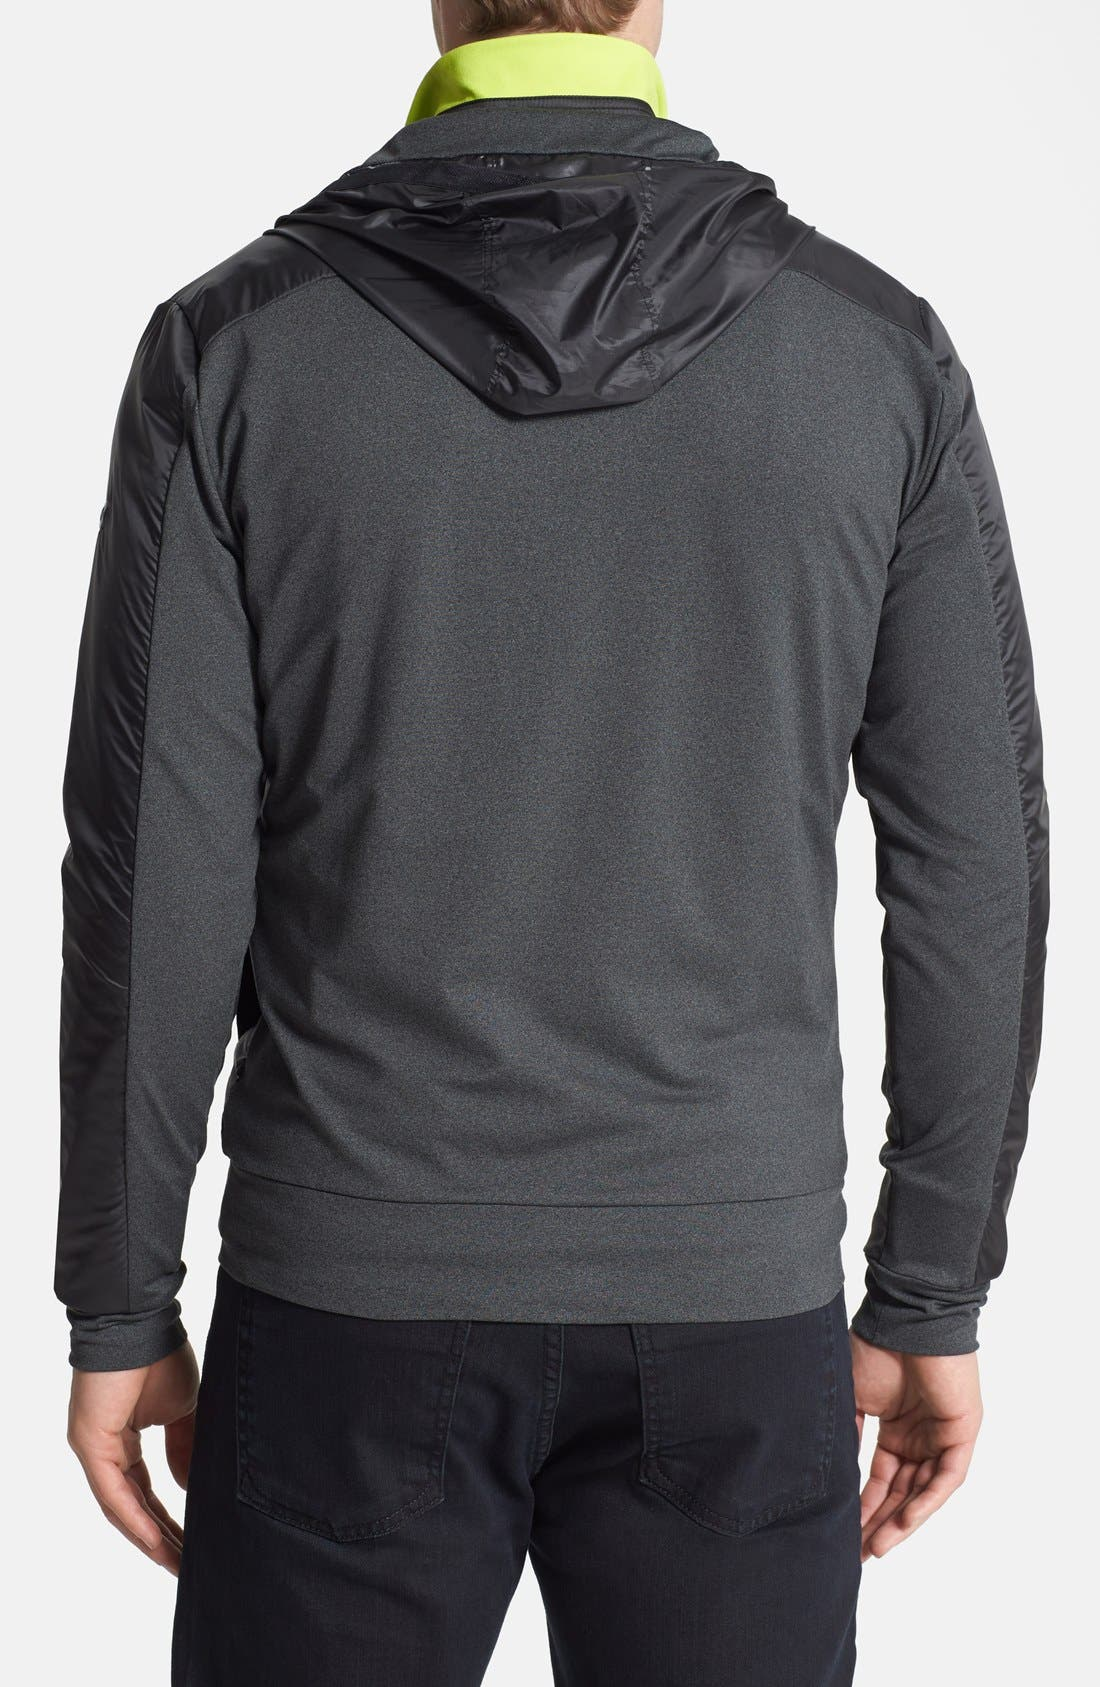 Alternate Image 2  - Victorinox Swiss Army® Moisture Wicking Technical Fleece Hooded Jacket (Online Only)